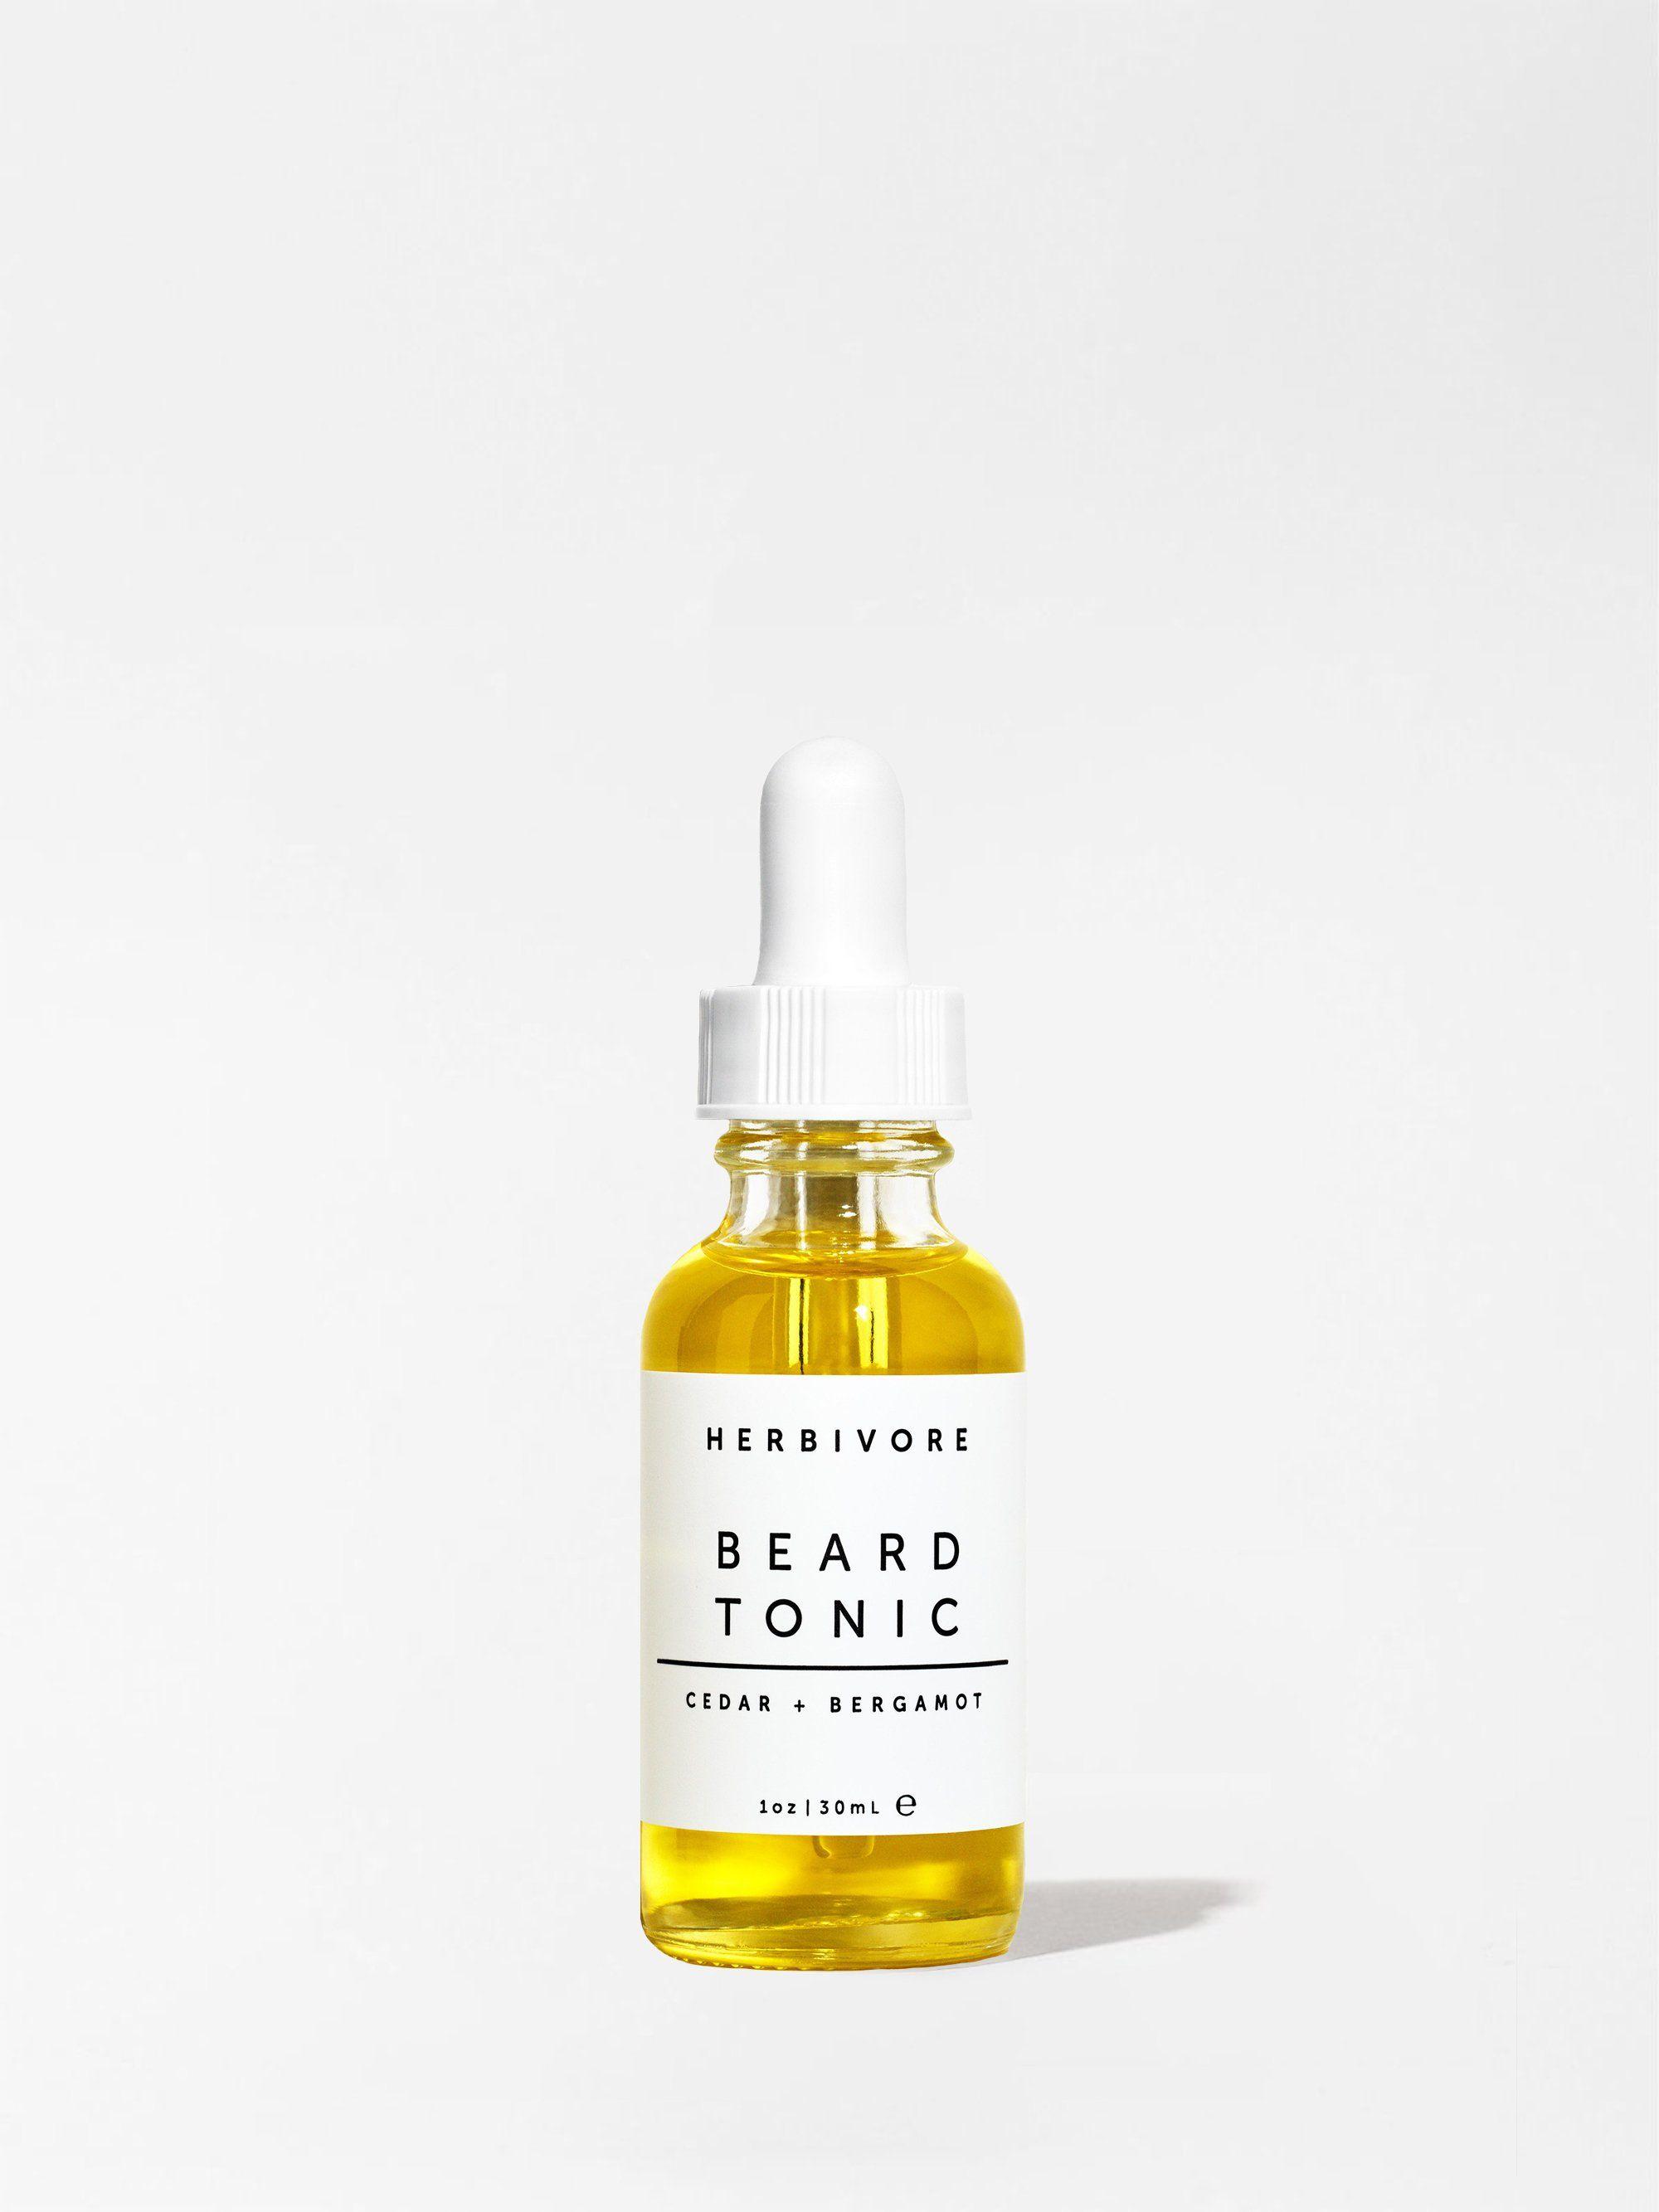 Cedar Bergamot Beard Tonic In 2020 Beard Tonic Earthy Scent Tonic